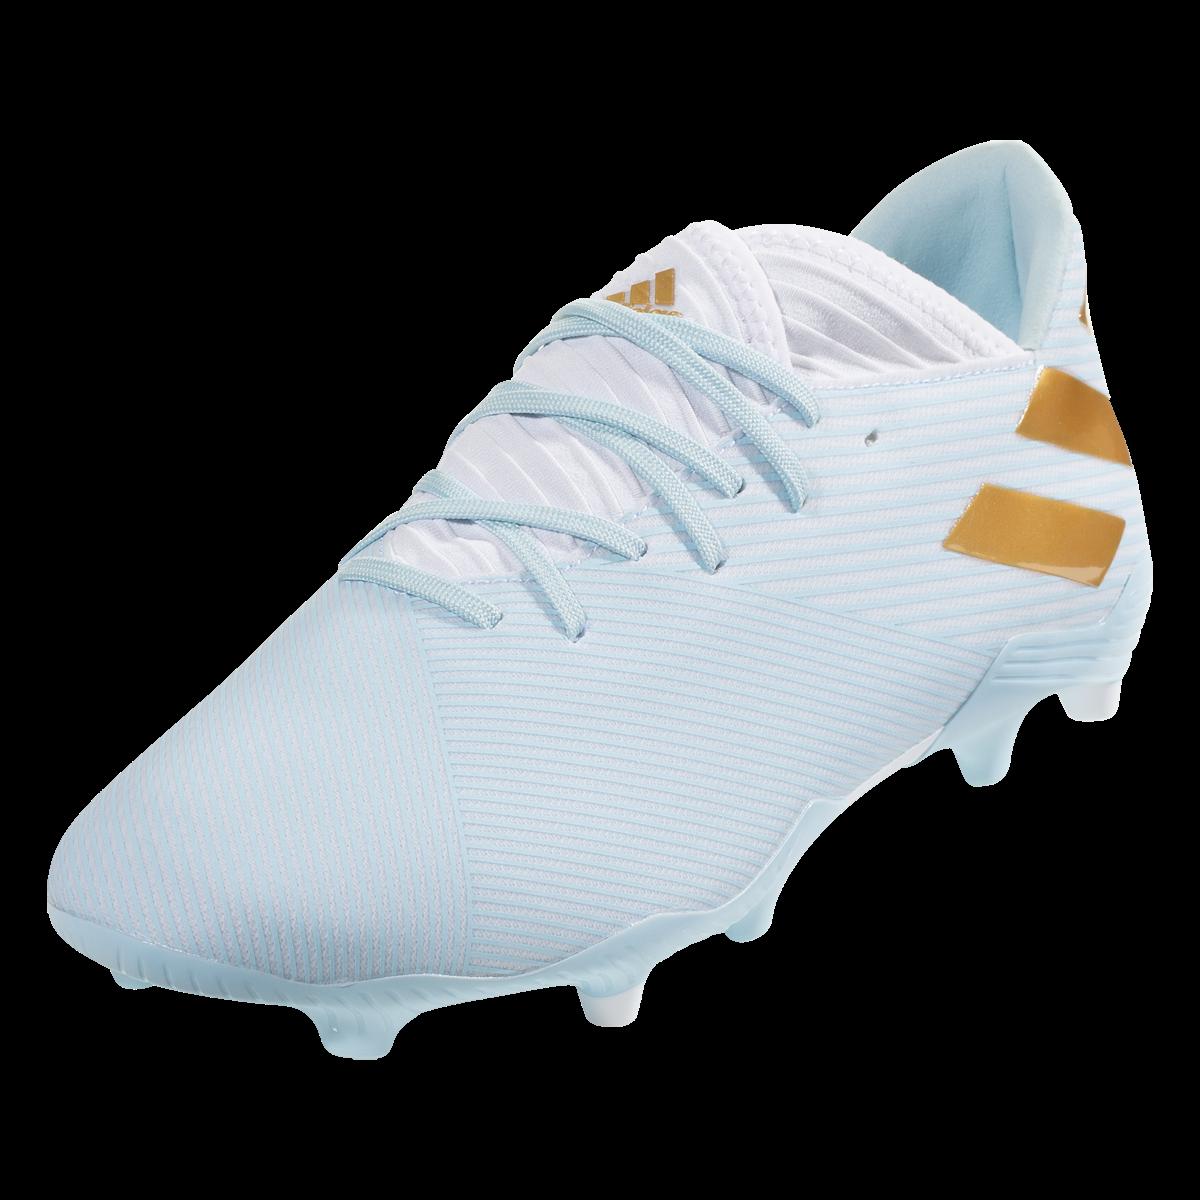 Soccer Cleats In 2020 Custom Soccer Cleats Soccer Cleats Adidas Best Soccer Cleats